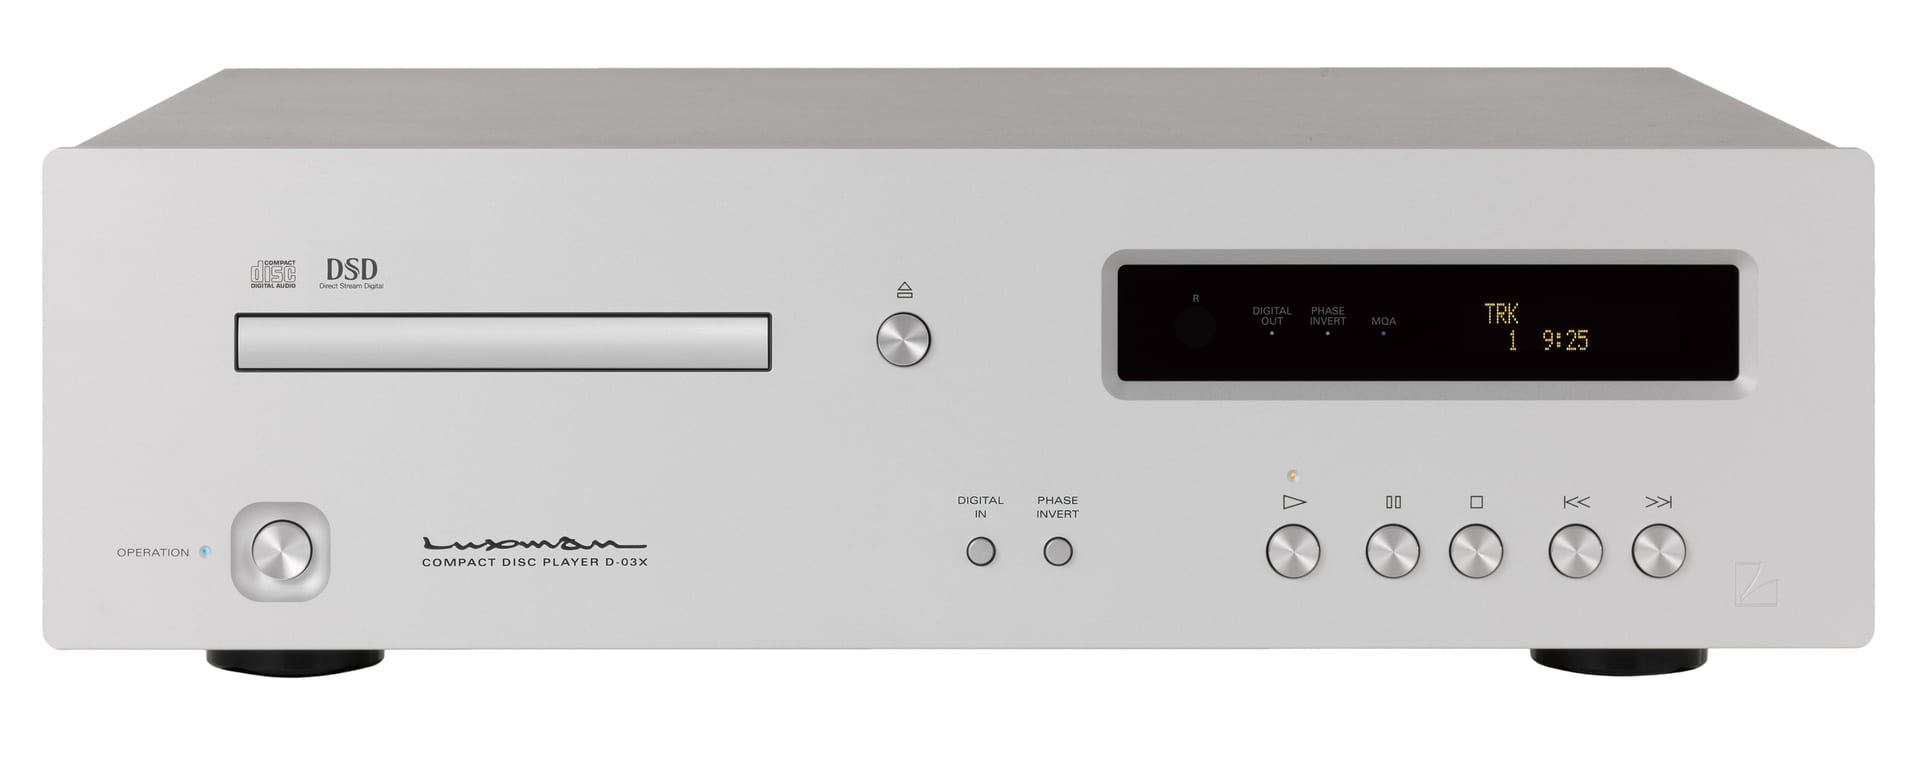 Luxman Introduces D-03X CD/Digital Media Player